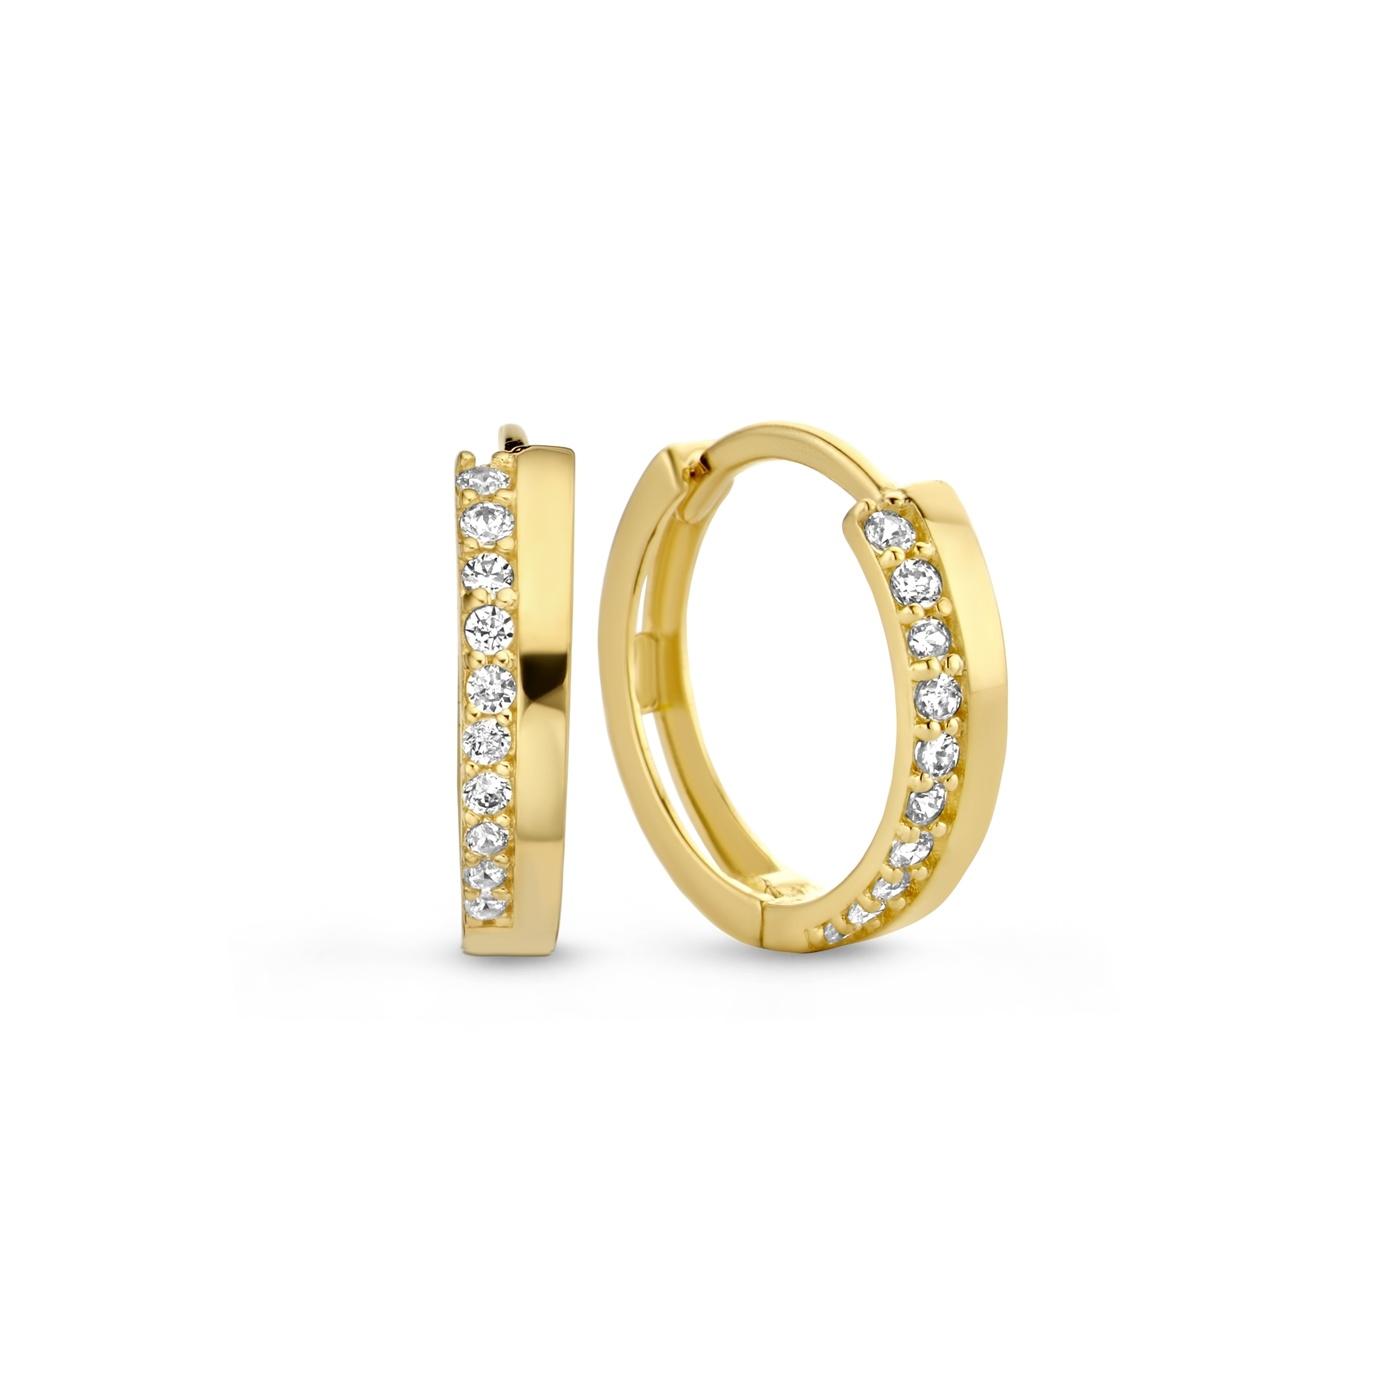 Isabel Bernard Le Marais Louna 14 carat gold creoles zirconia 13mm